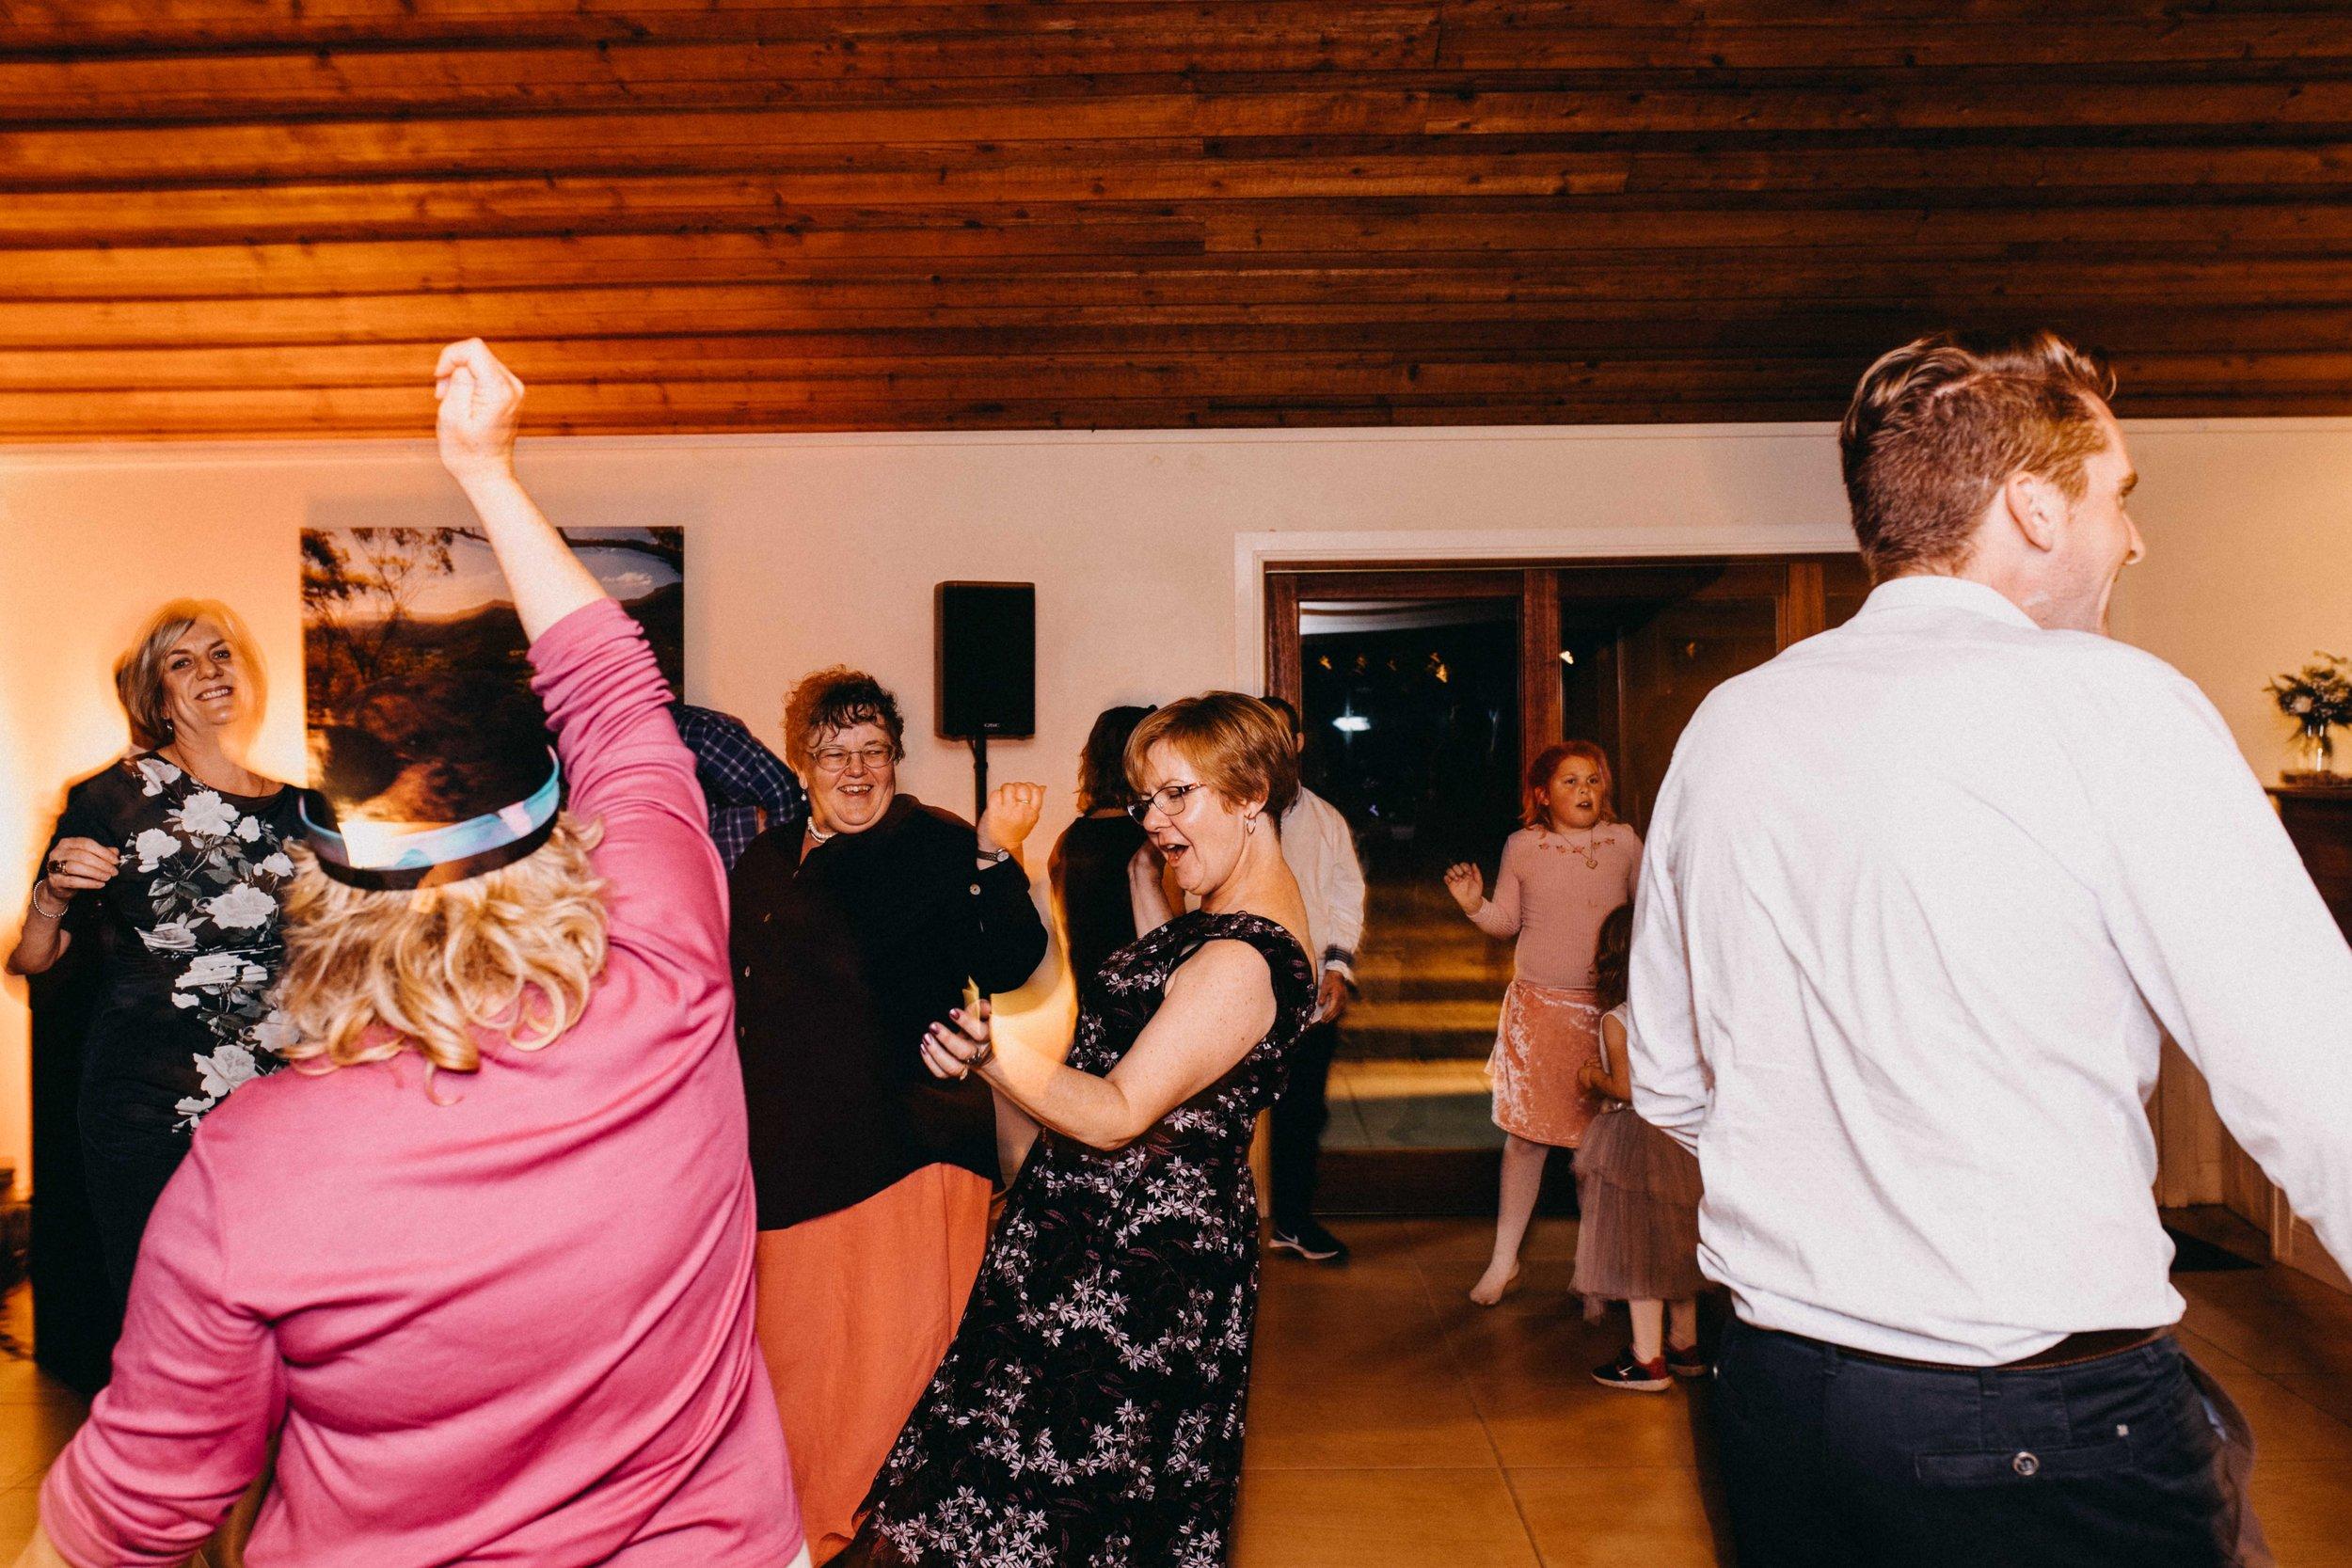 kangaroo-valley-bush-retreat-wedding-lydia-nate-www.emilyobrienphotography.net-174.jpg